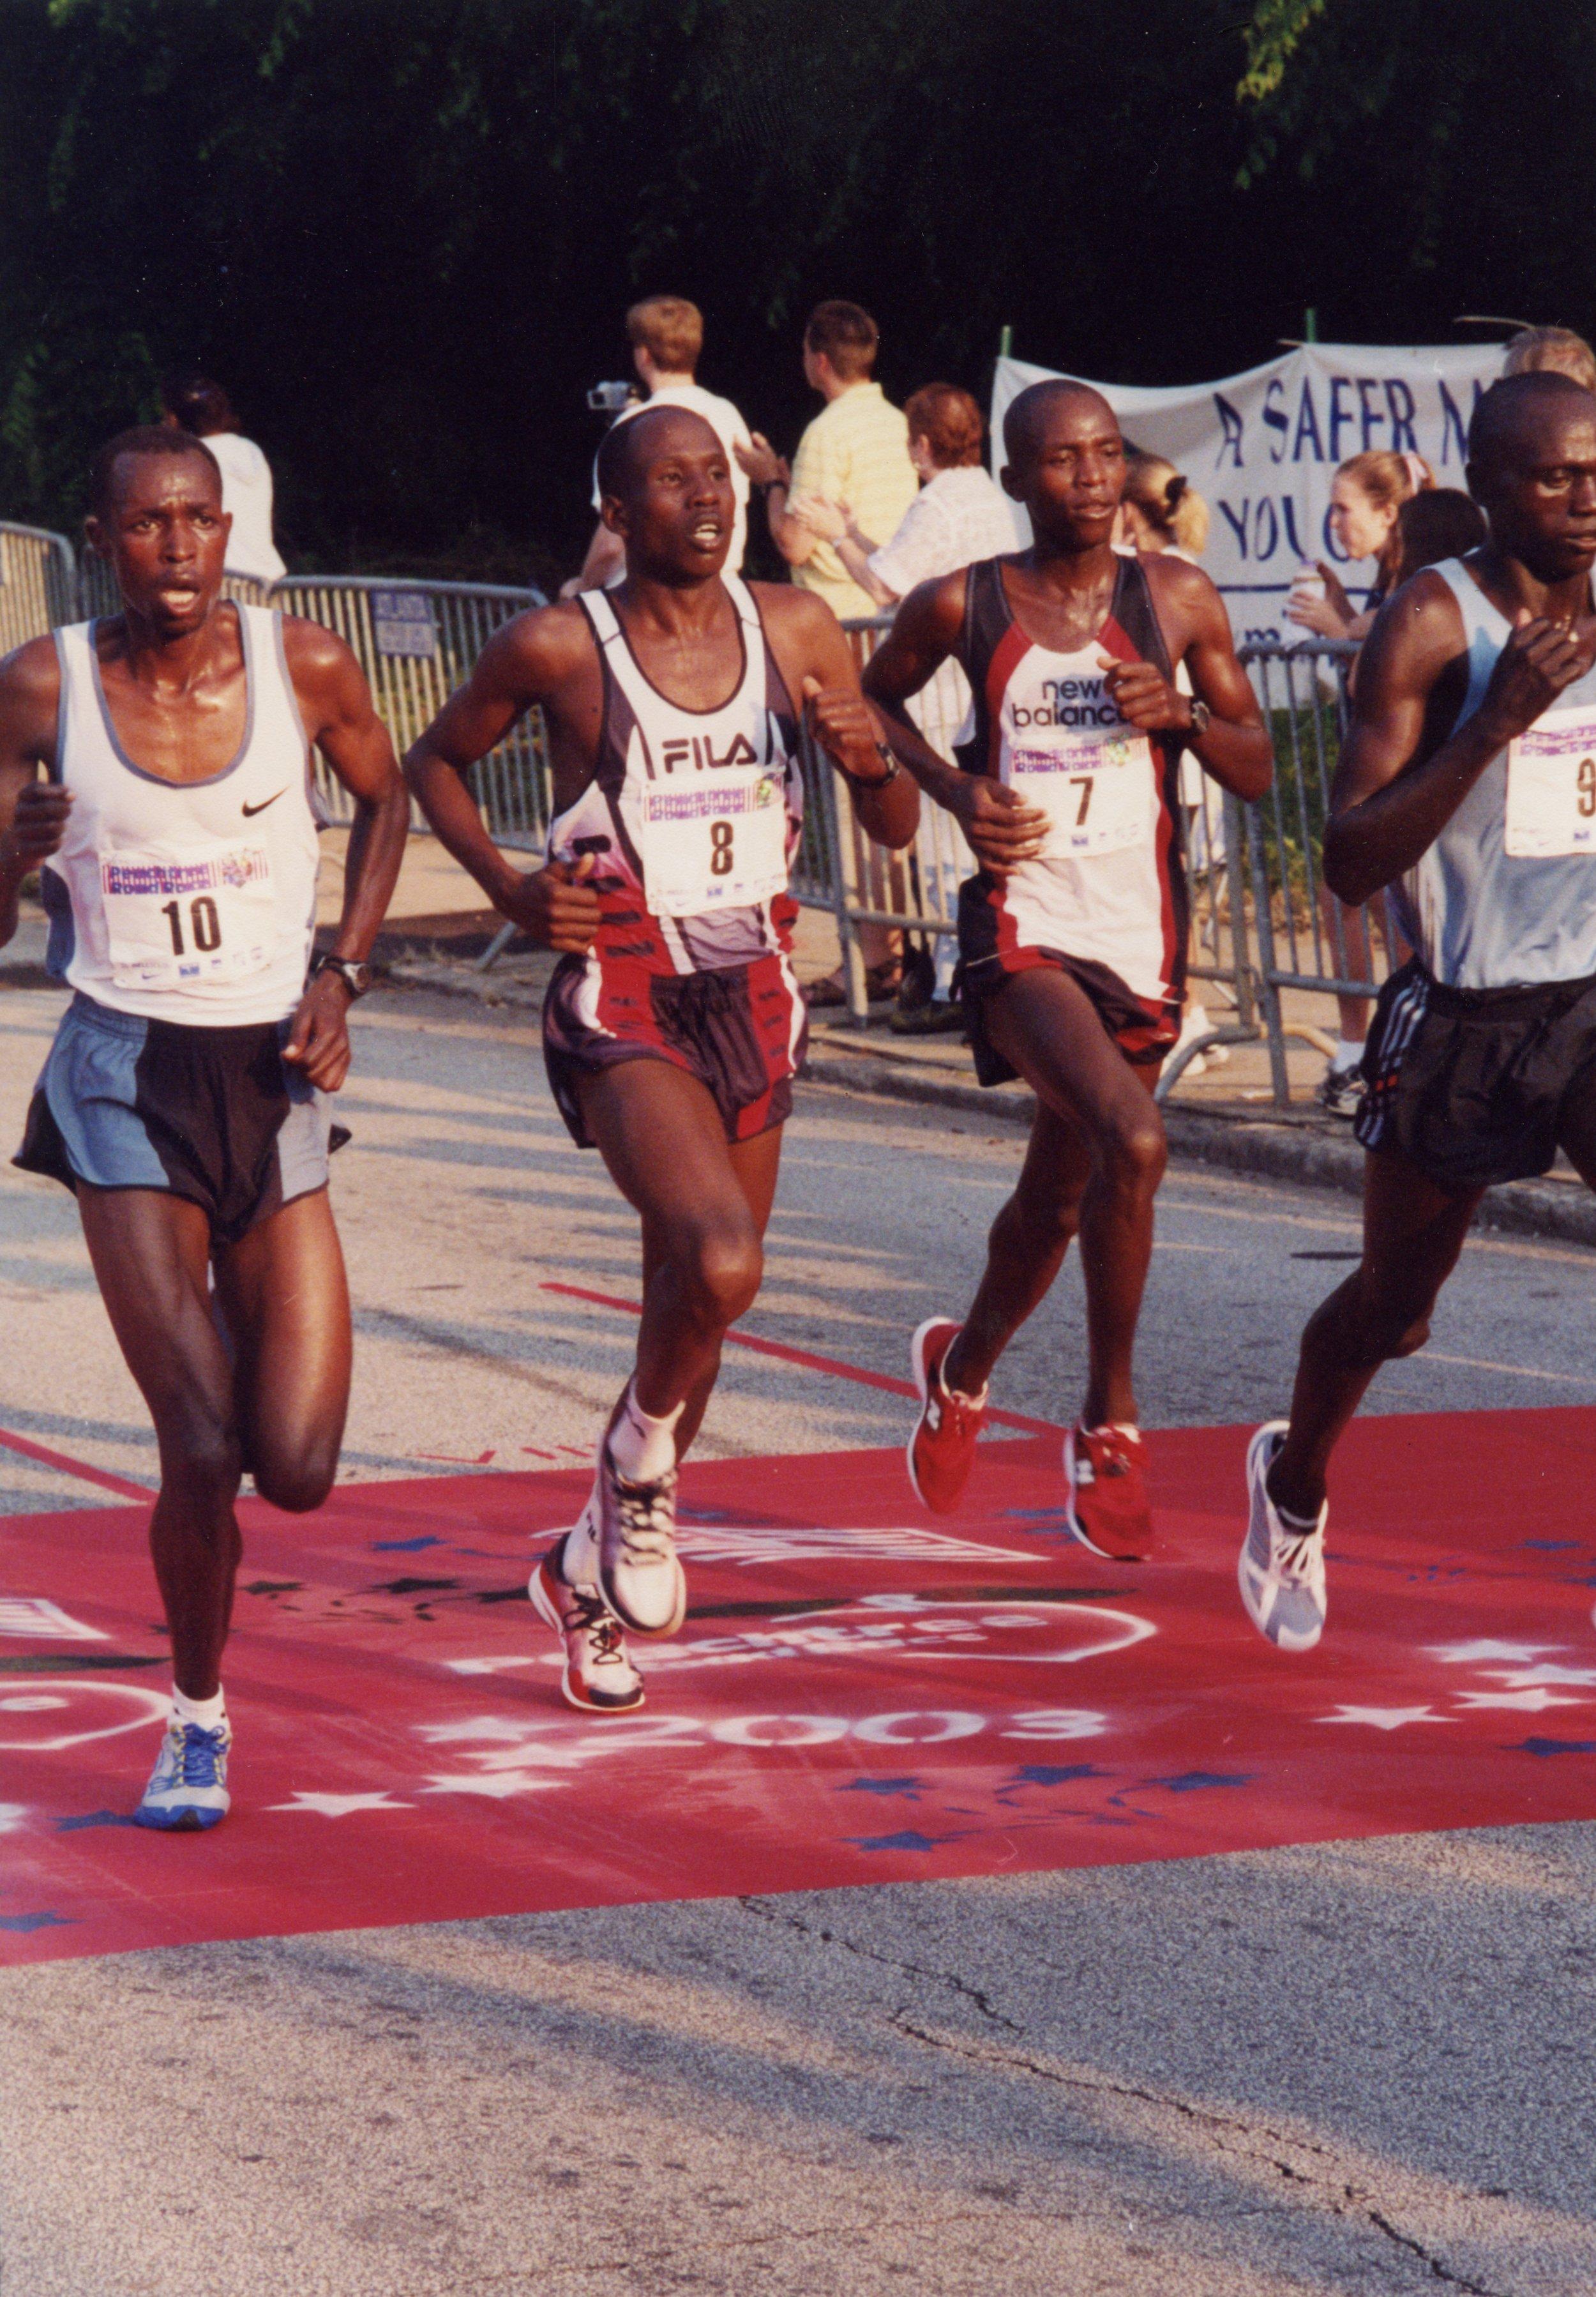 Gilbert Koech, Martin Lel, Evans Rutto, Felix Limo 2003.jpg